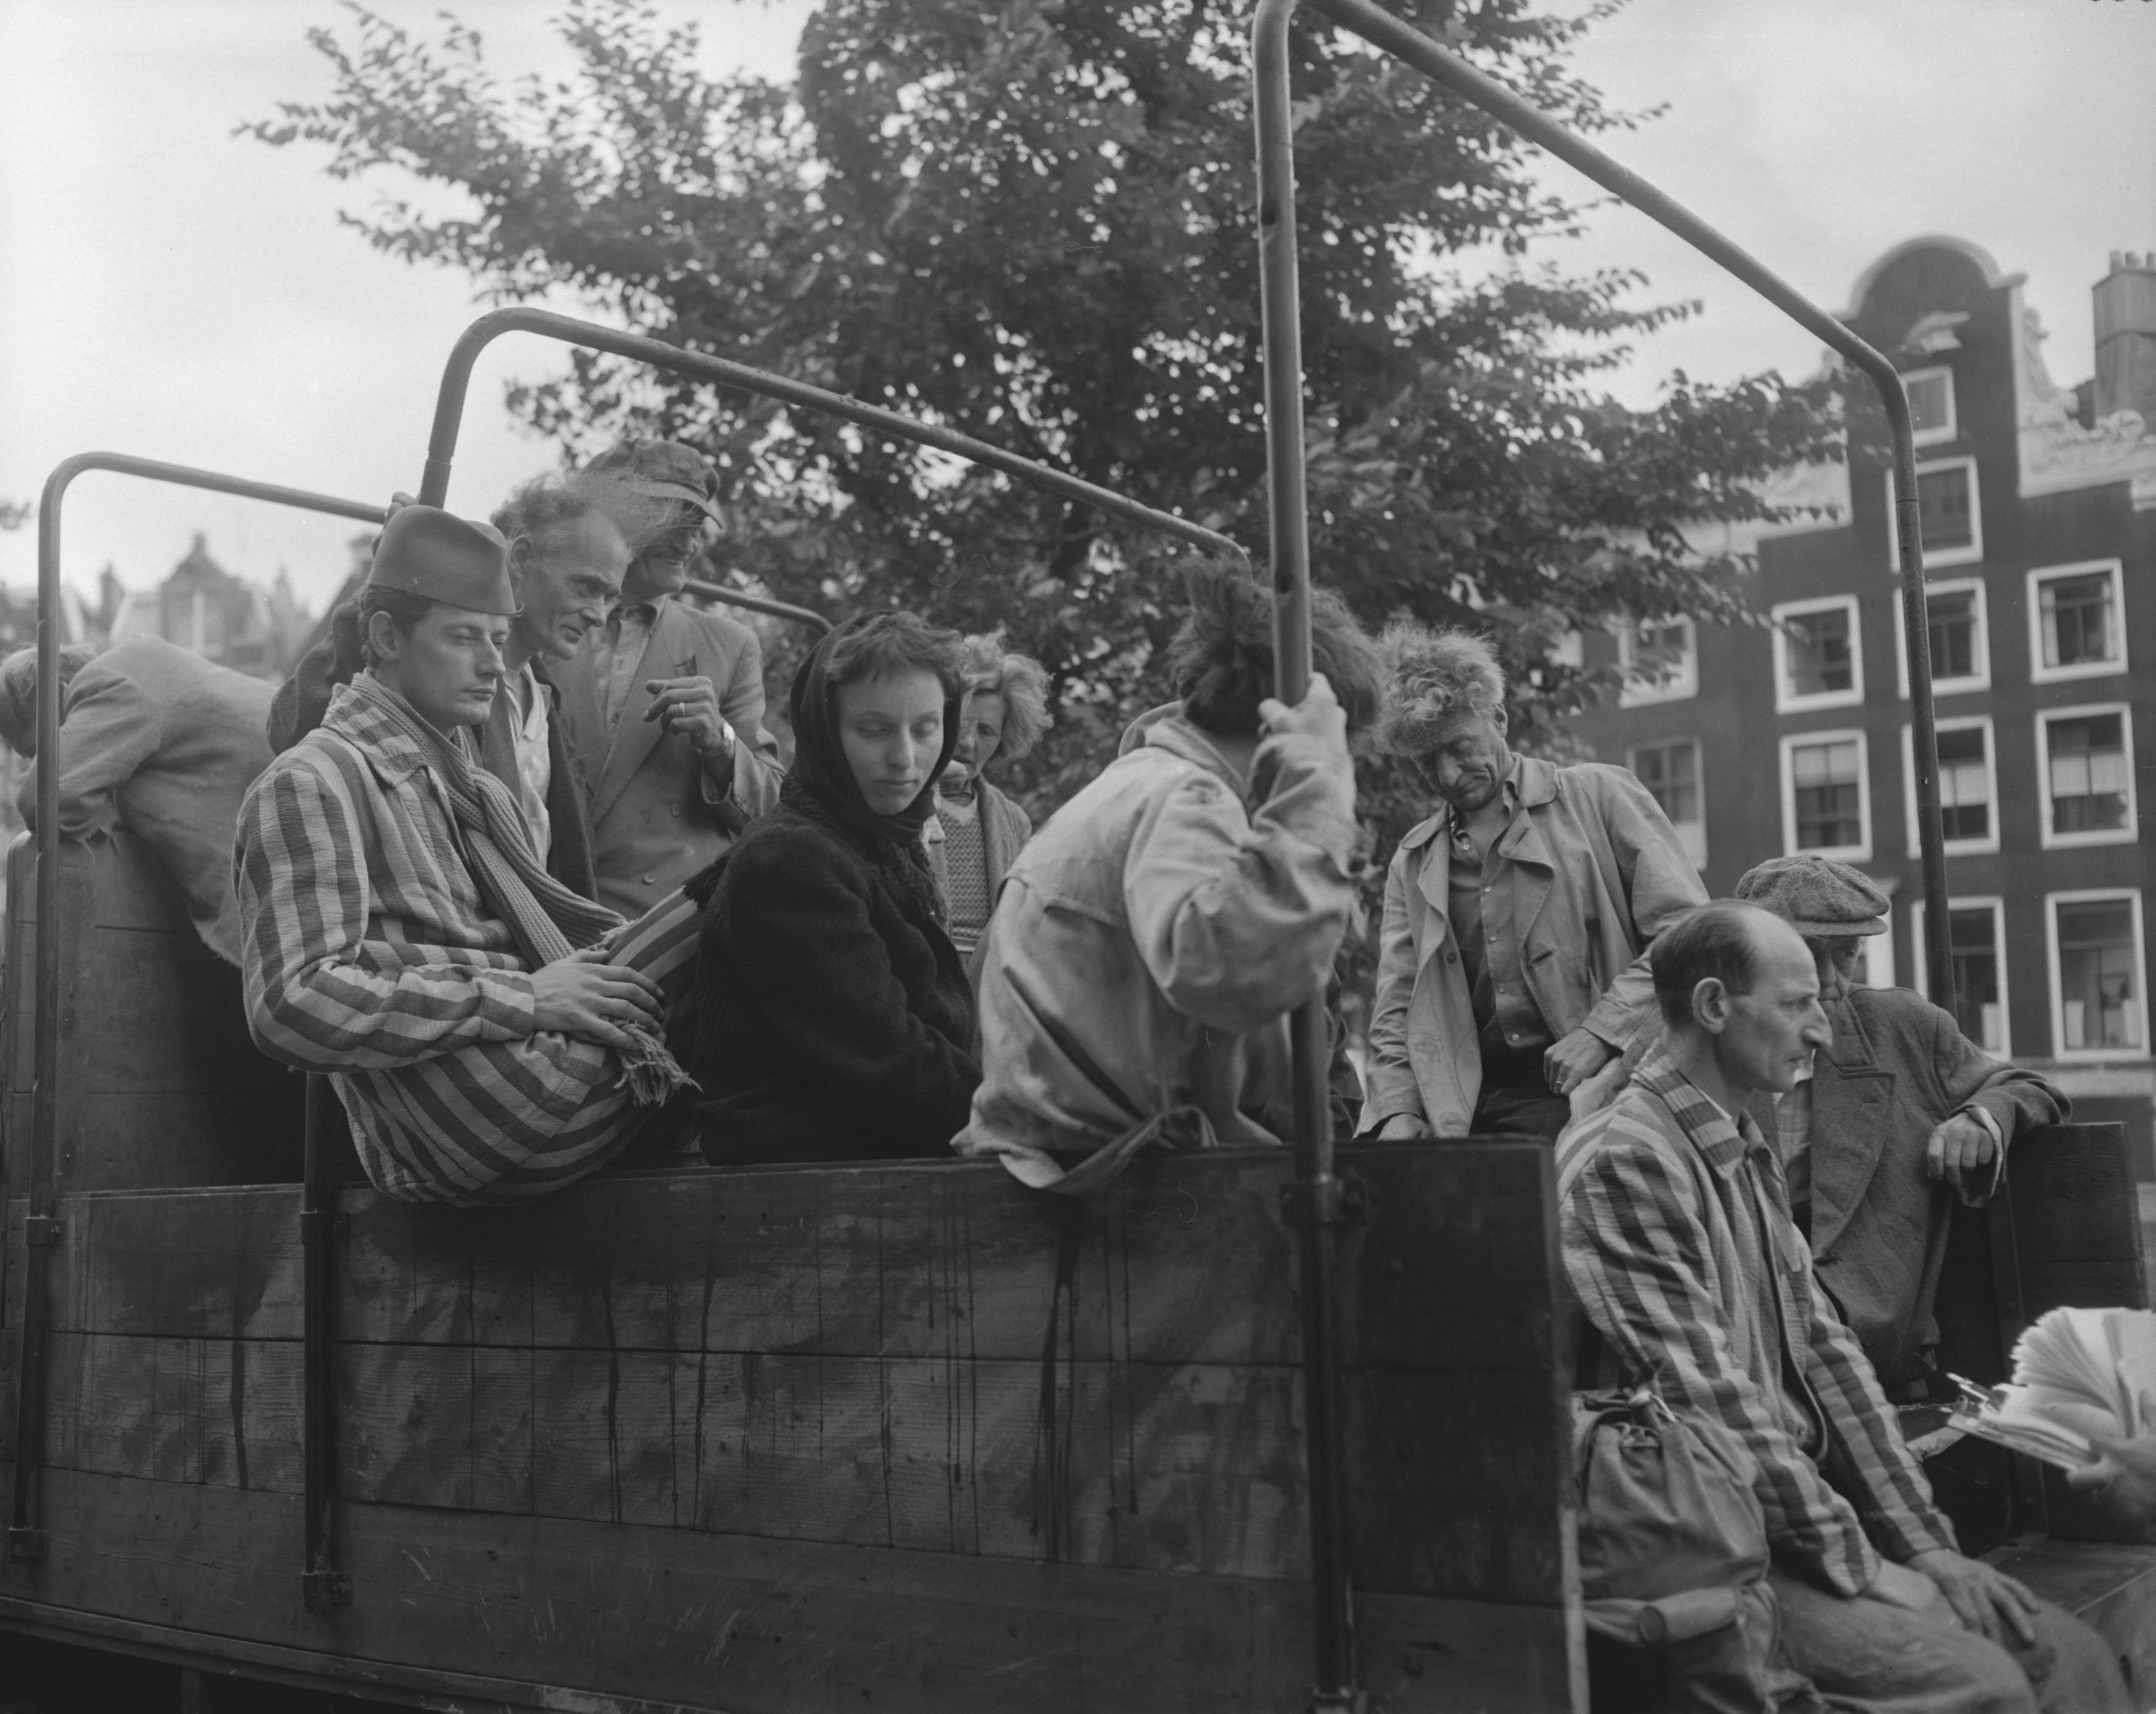 Citaten Uit Dagboek Anne Frank : The diary of anne frank 1959 wikipedia